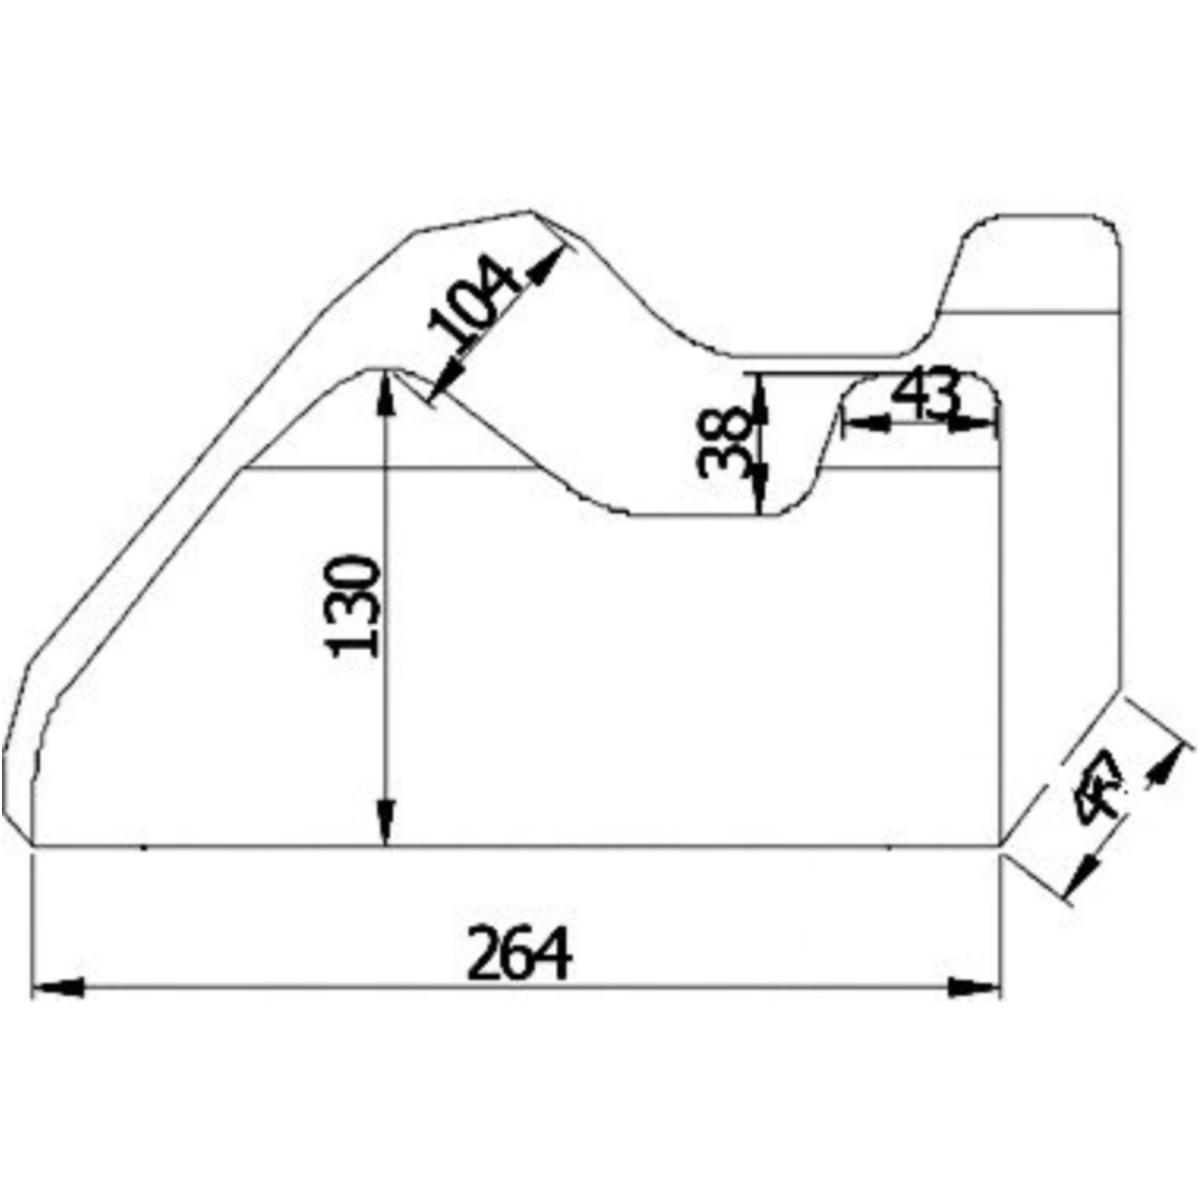 jmp bike cover 1000cc f�r harley davidson fls softail slim abs 1690 jrv 2014, 79 ps, 58 kw dyna models parts catalog